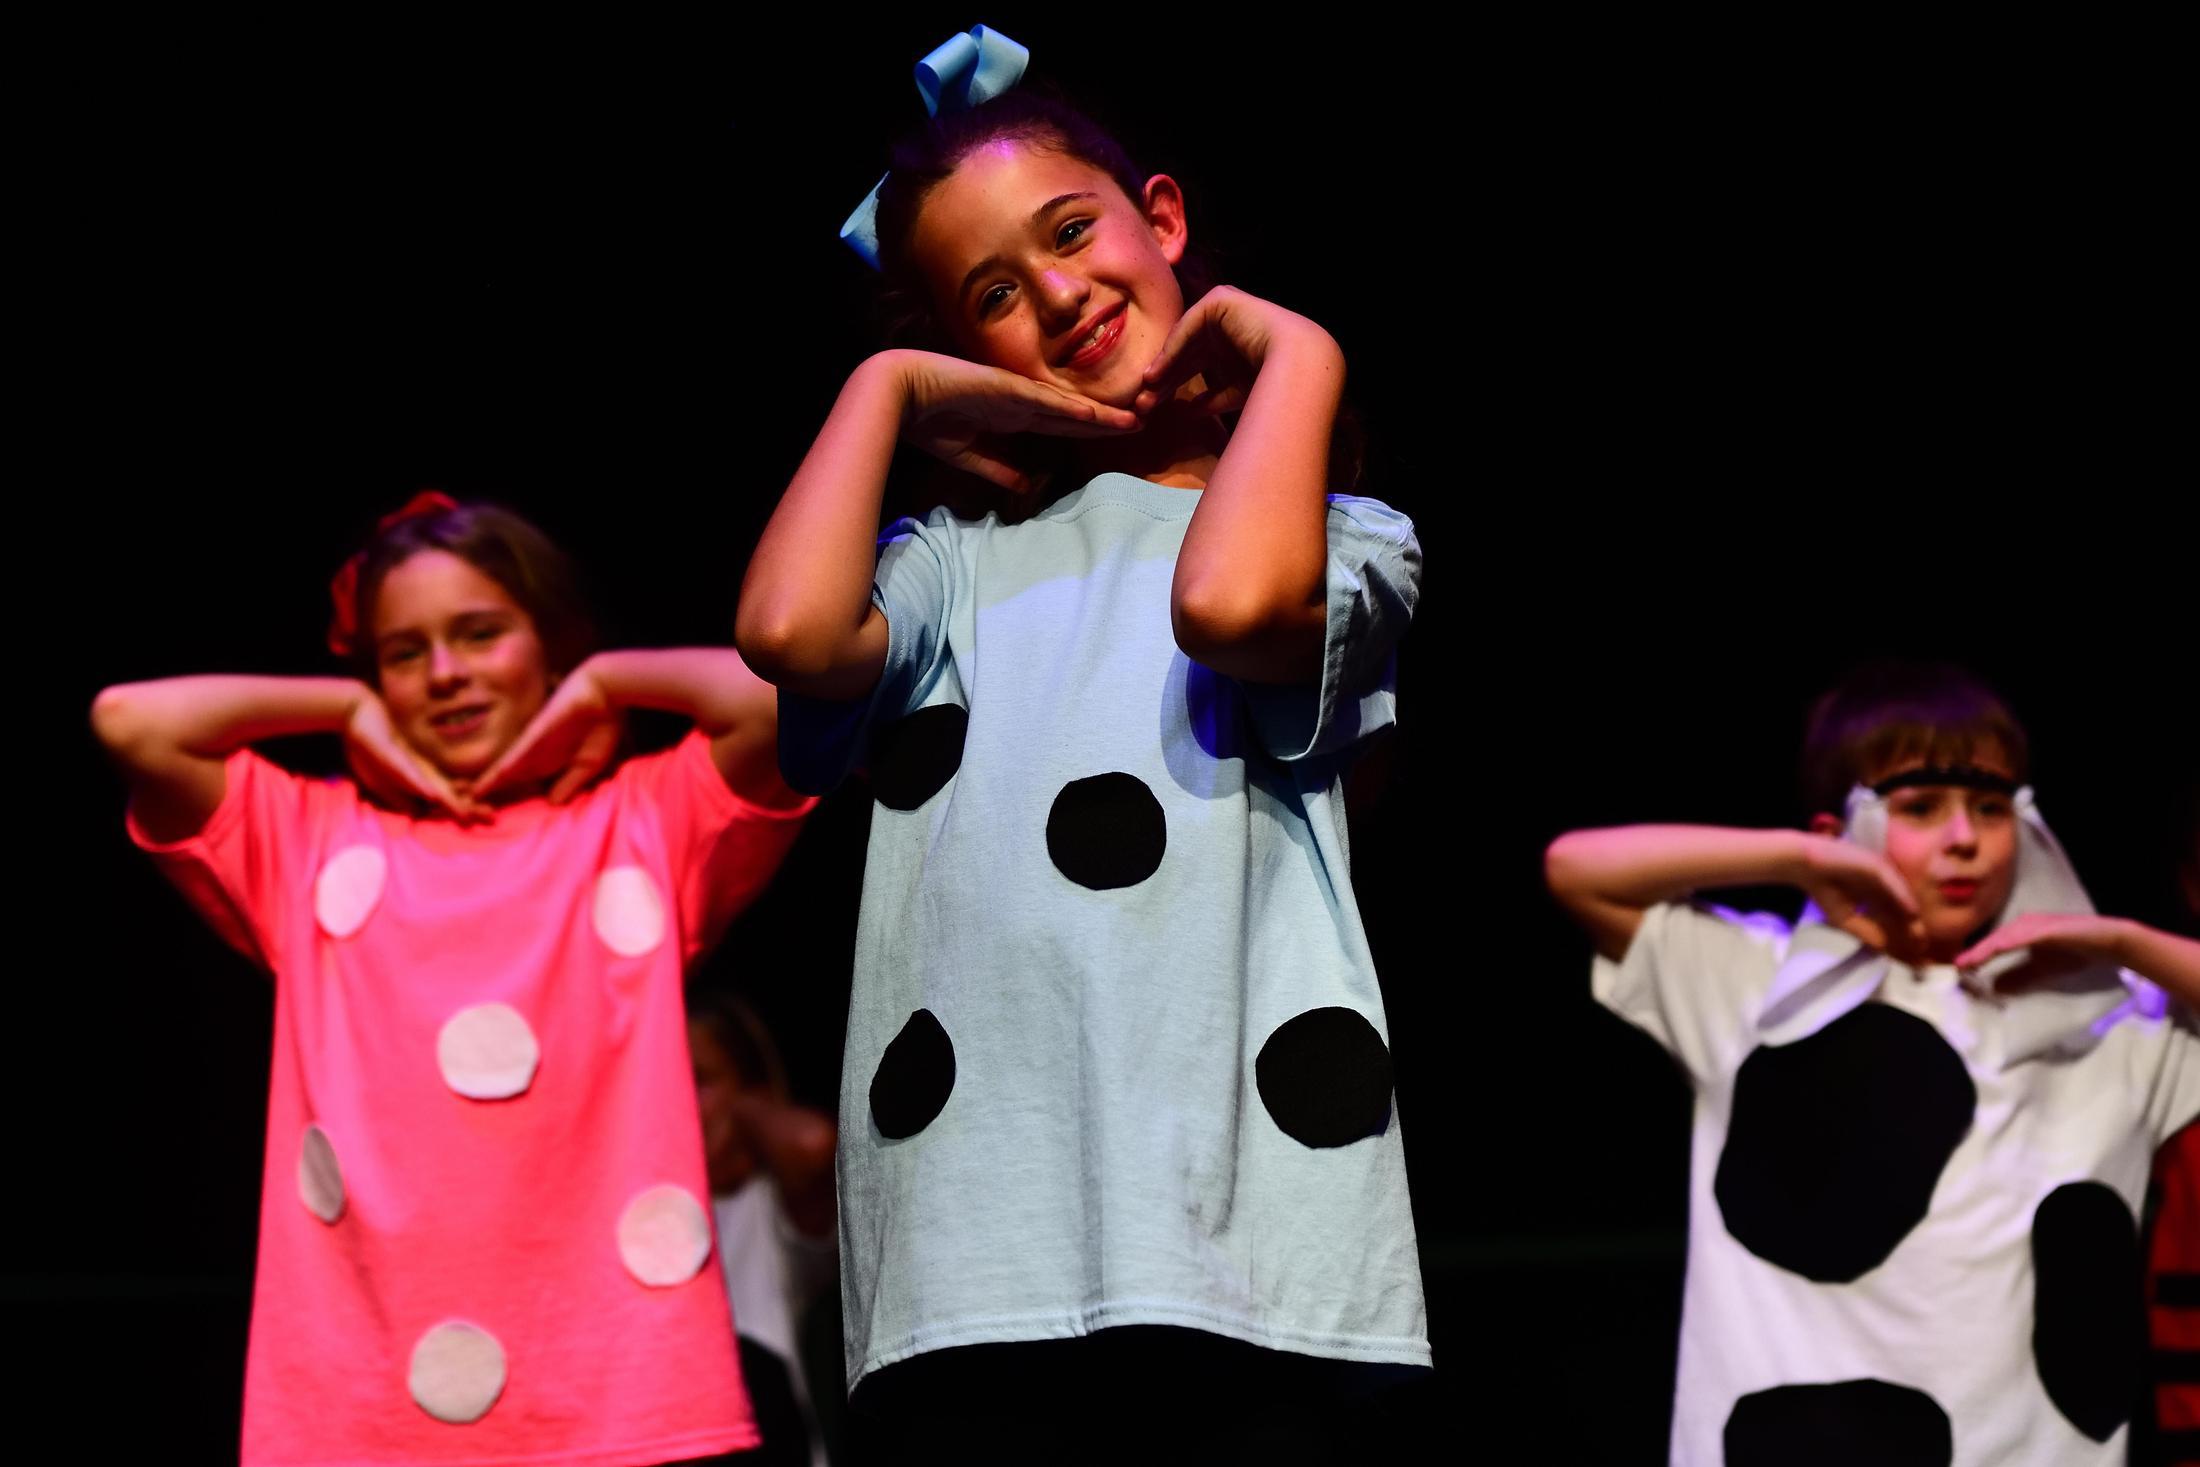 Home – The Arts – Capistrano Valley Christian Schools